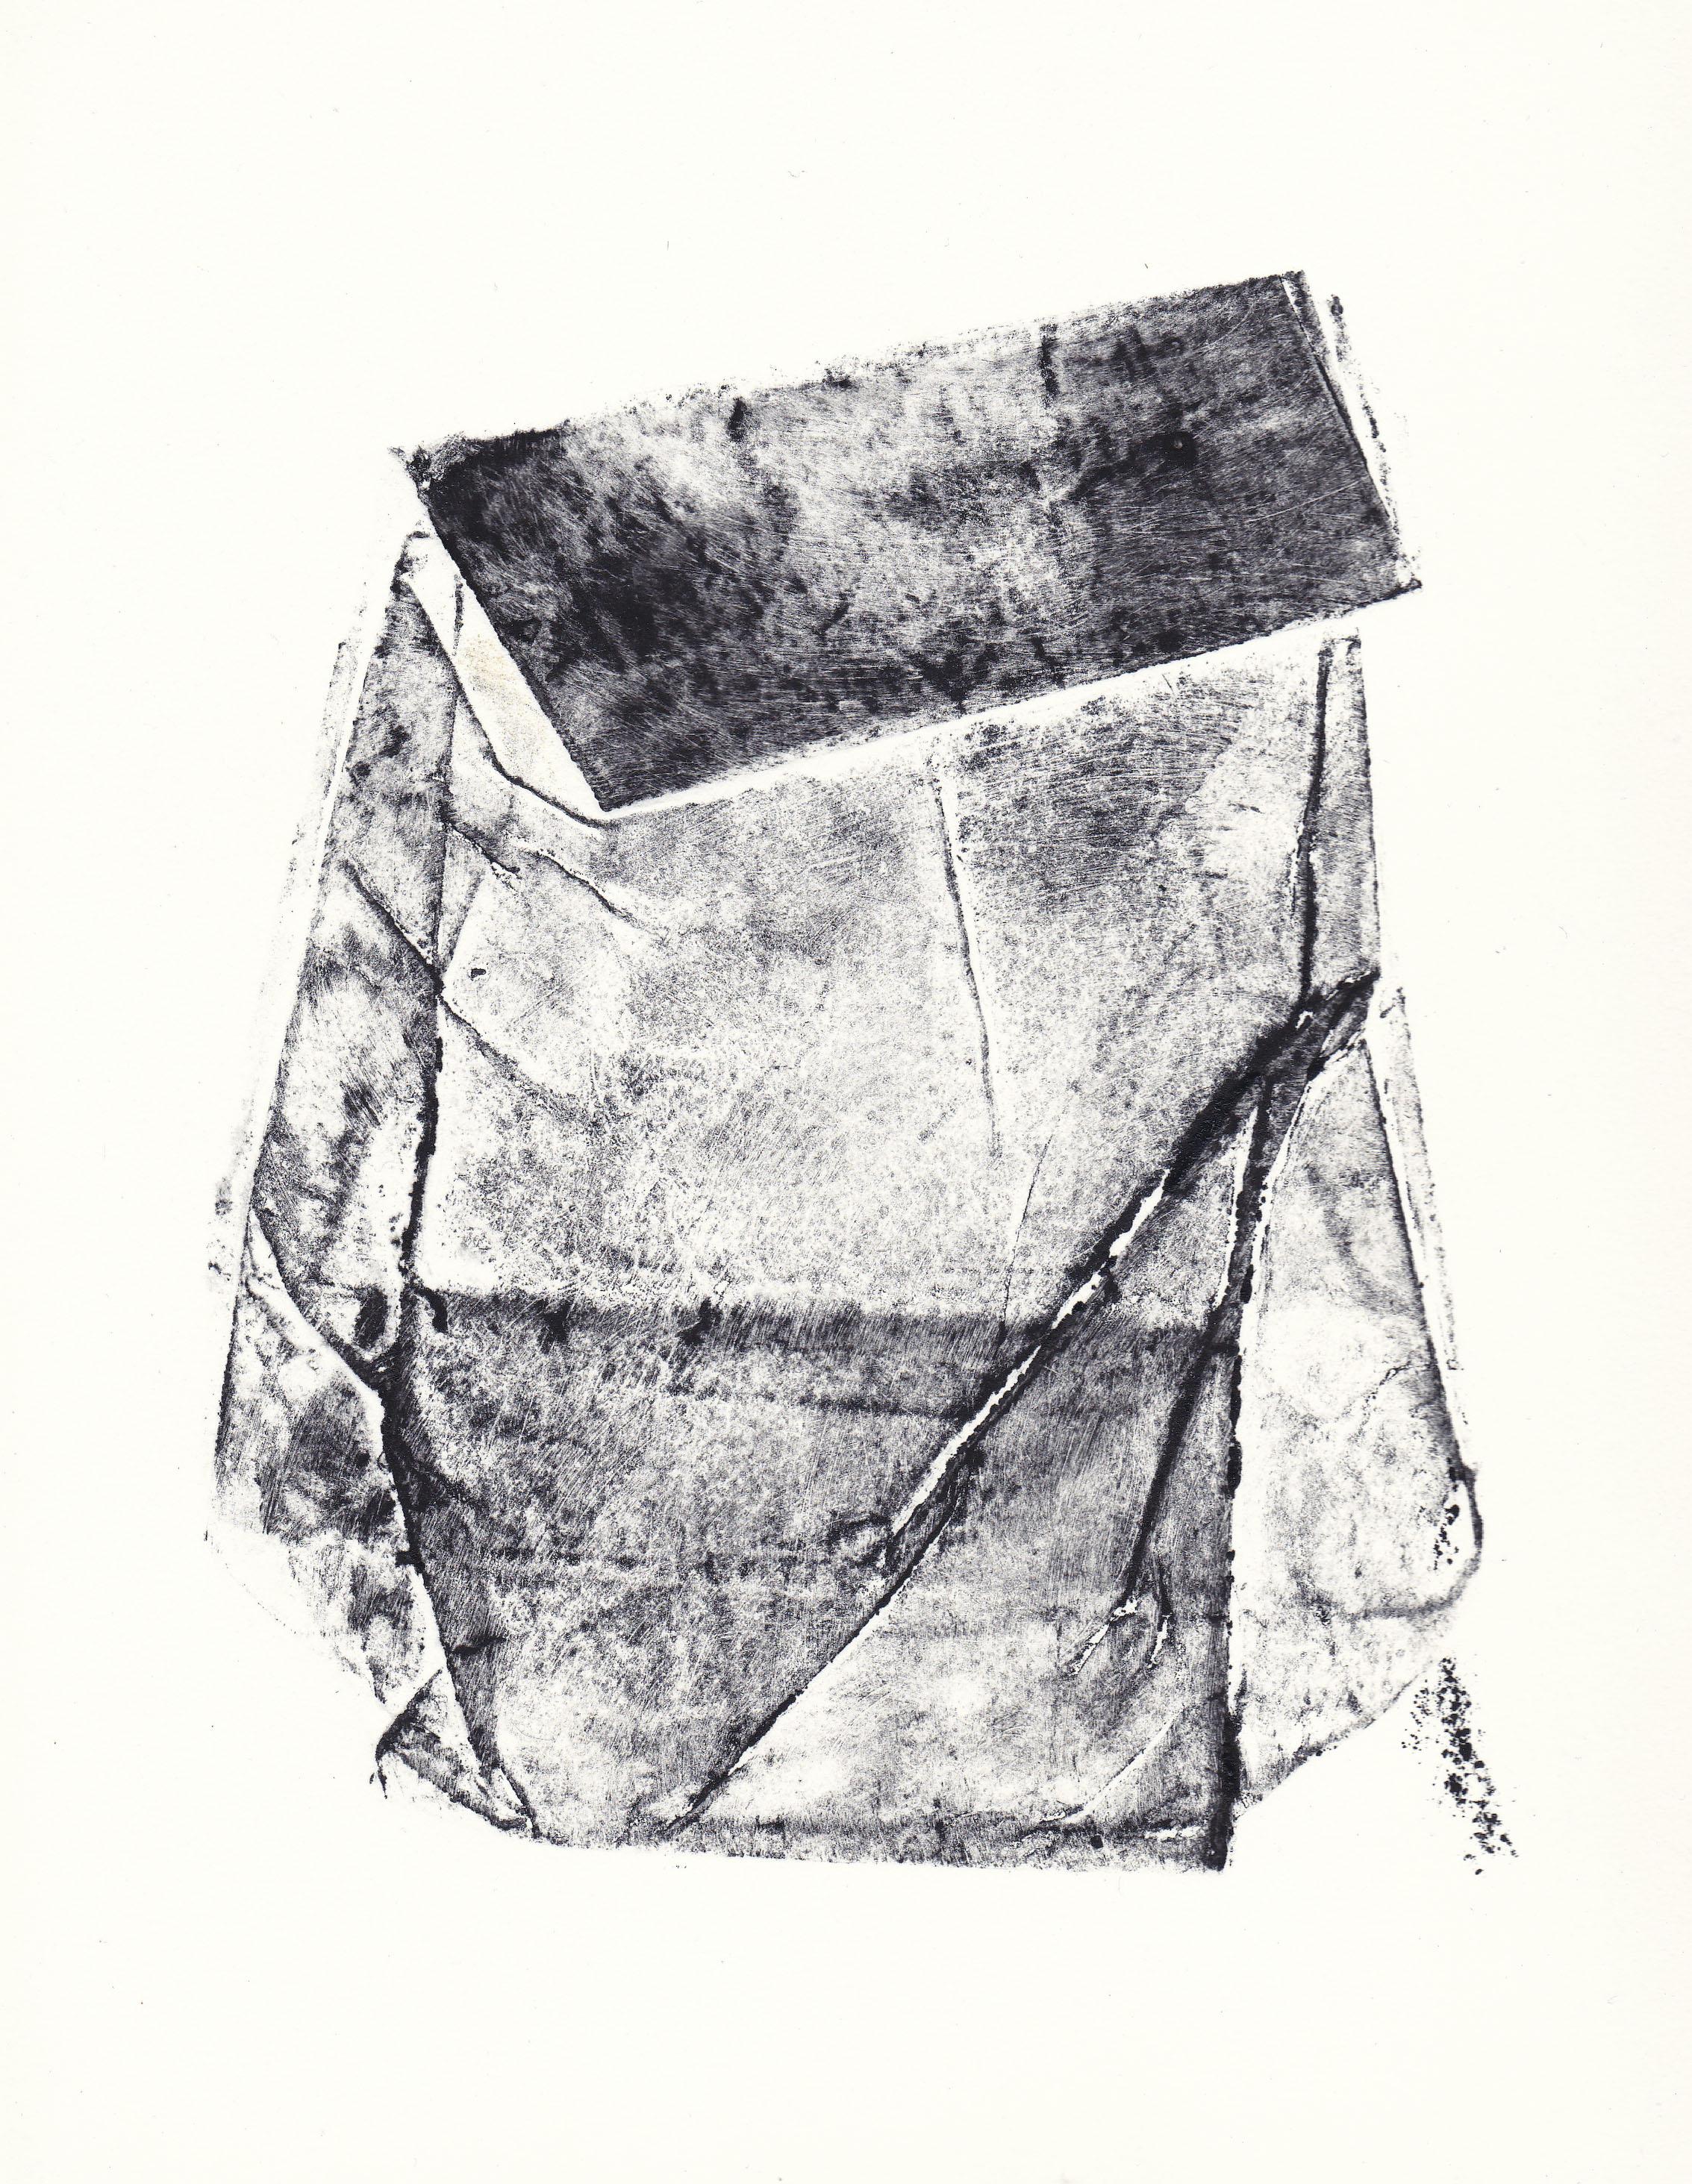 Topography of a Flour Bag III   collagraph print  2012